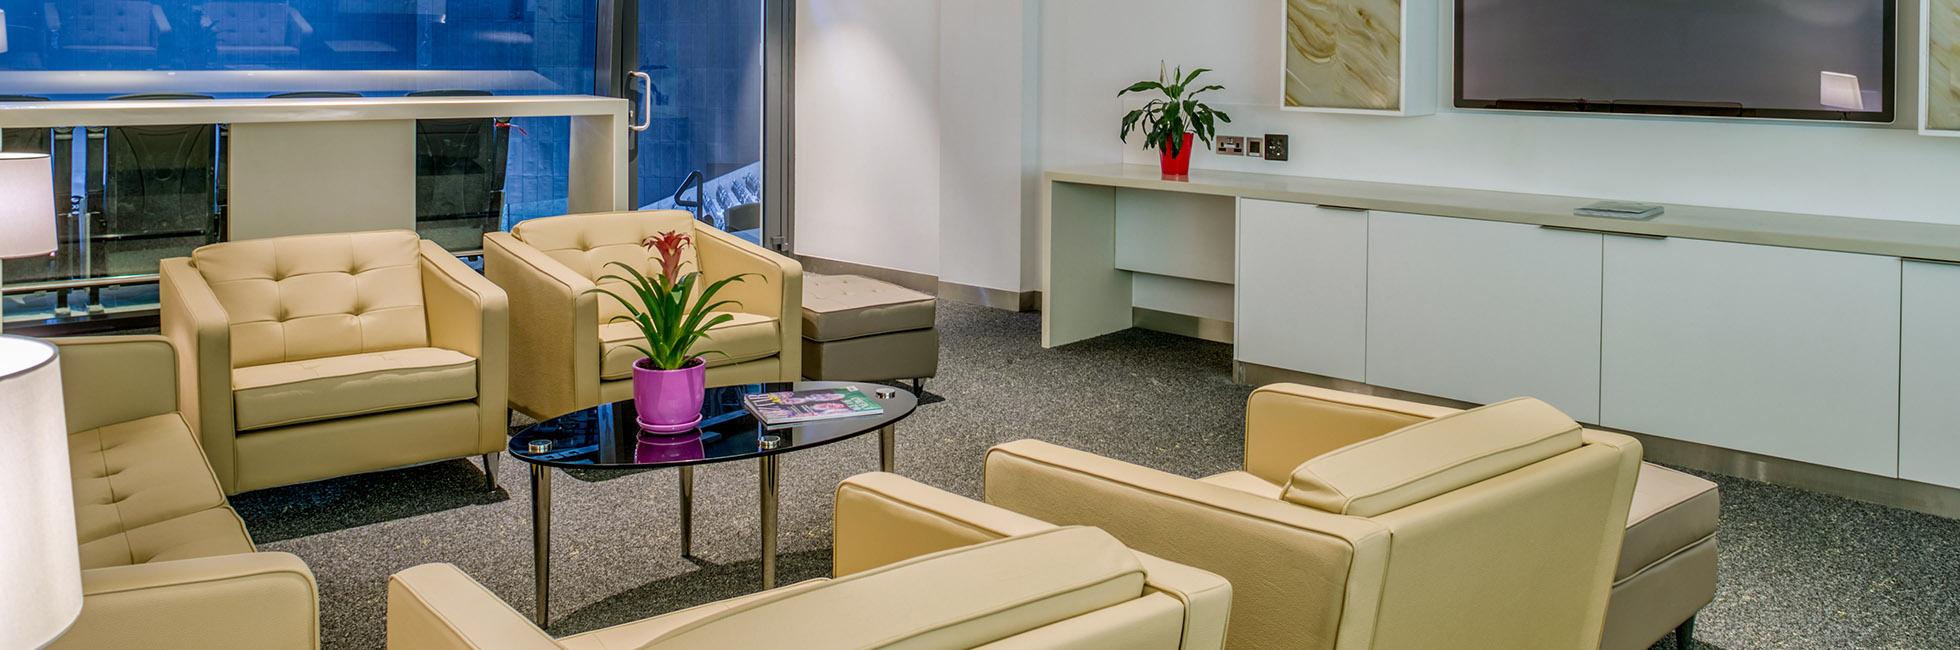 VIP arrival area for Luxury Suites at Etihad Arena